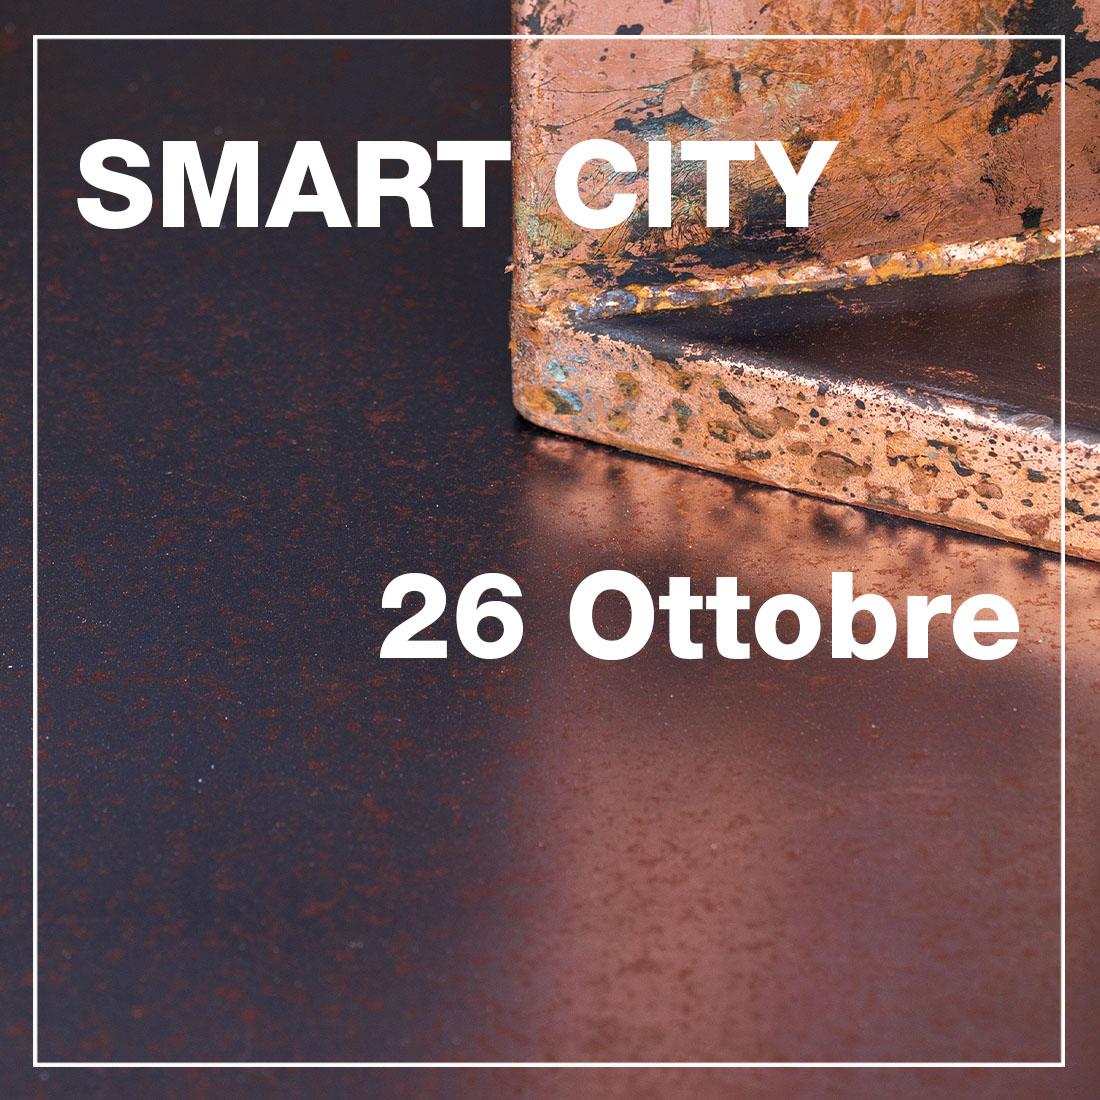 Smart city - 26 Ottobre